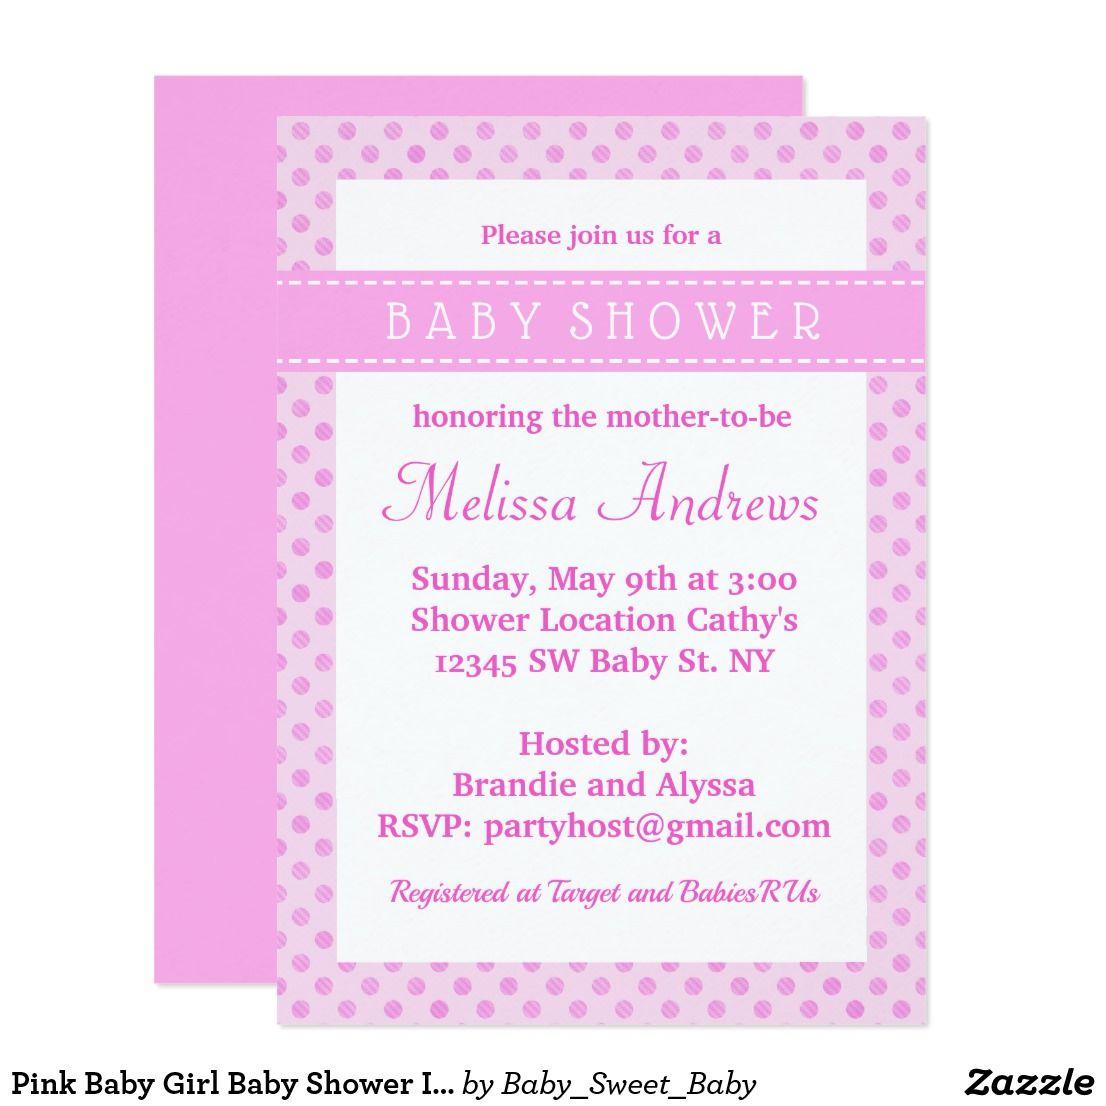 Pink Baby Girl Baby Shower Invitation | Custom baby shower ...